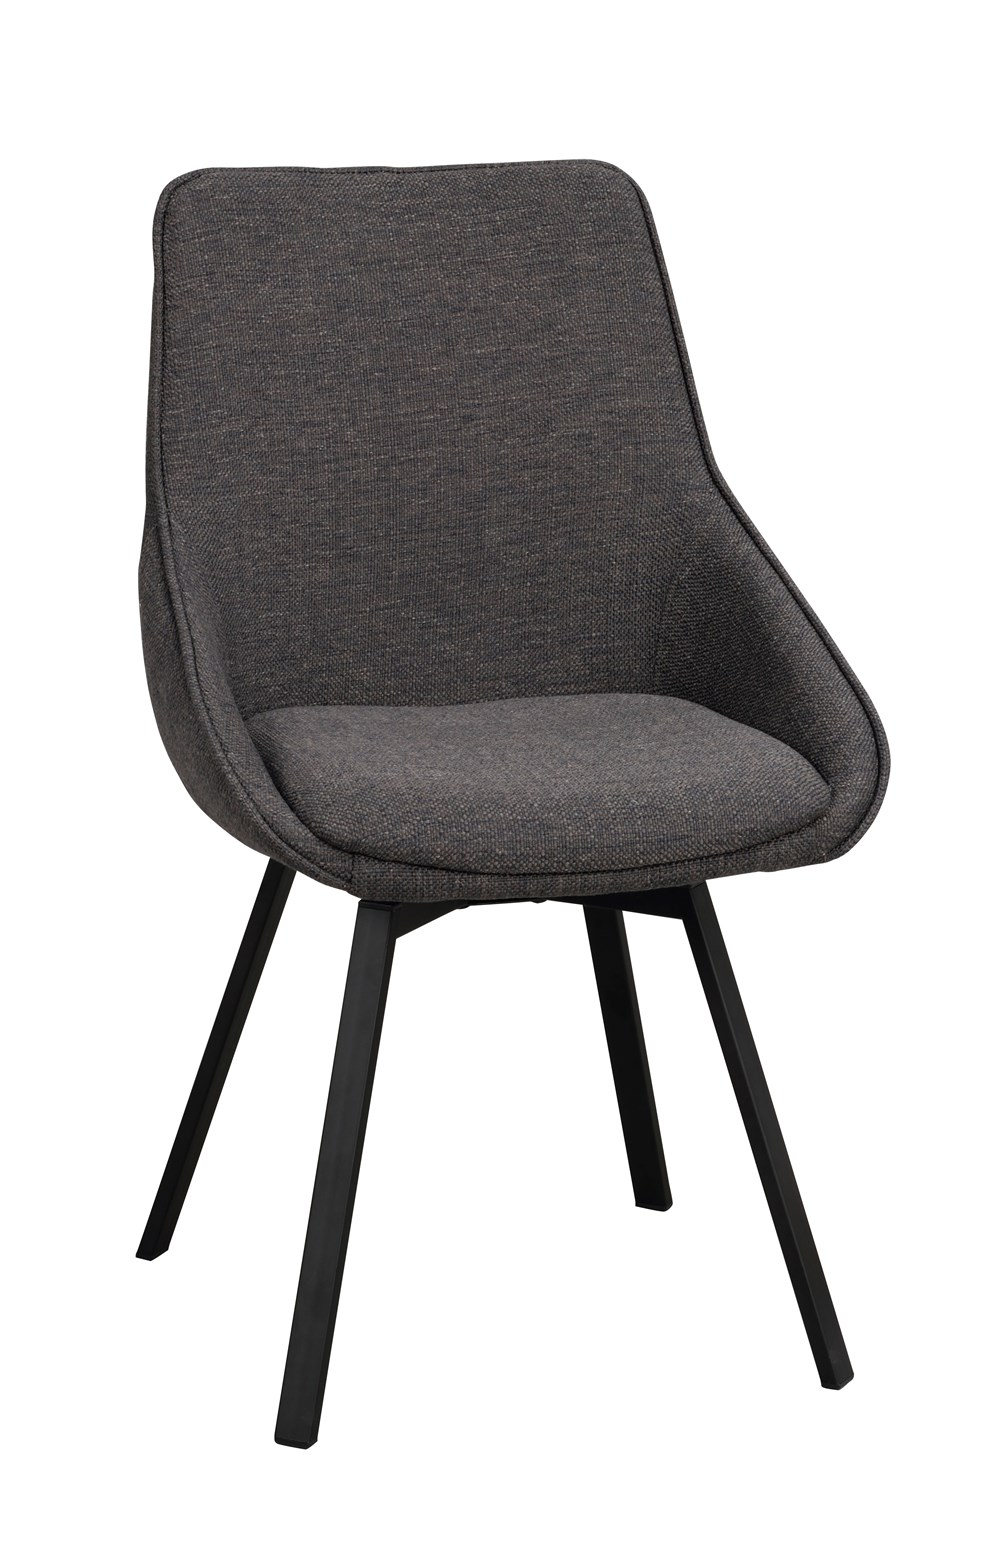 Alison tuoli harmaa/musta, Rowico